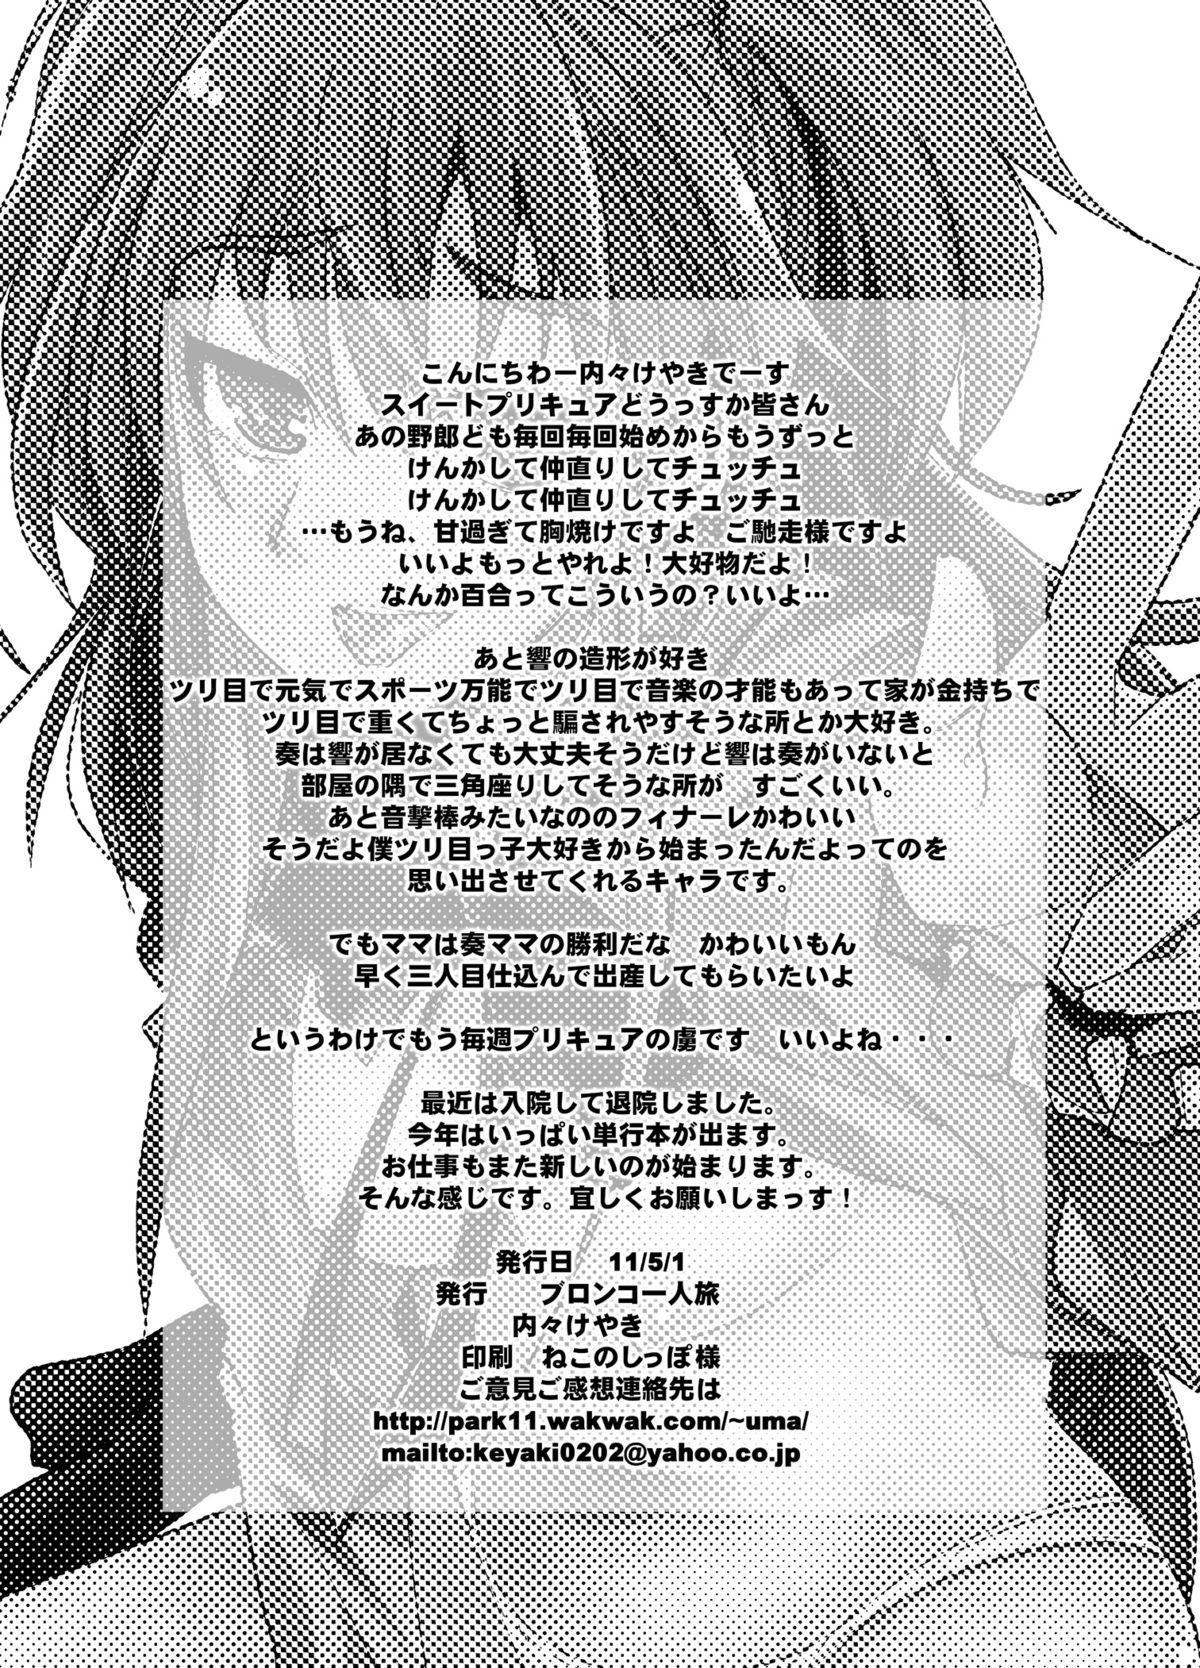 (COMIC1☆5) [Bronco Hitoritabi (Uchi-Uchi Keyaki)] Yoru ni hibiku - Sounds at night - JP (Suite Precure ) 24